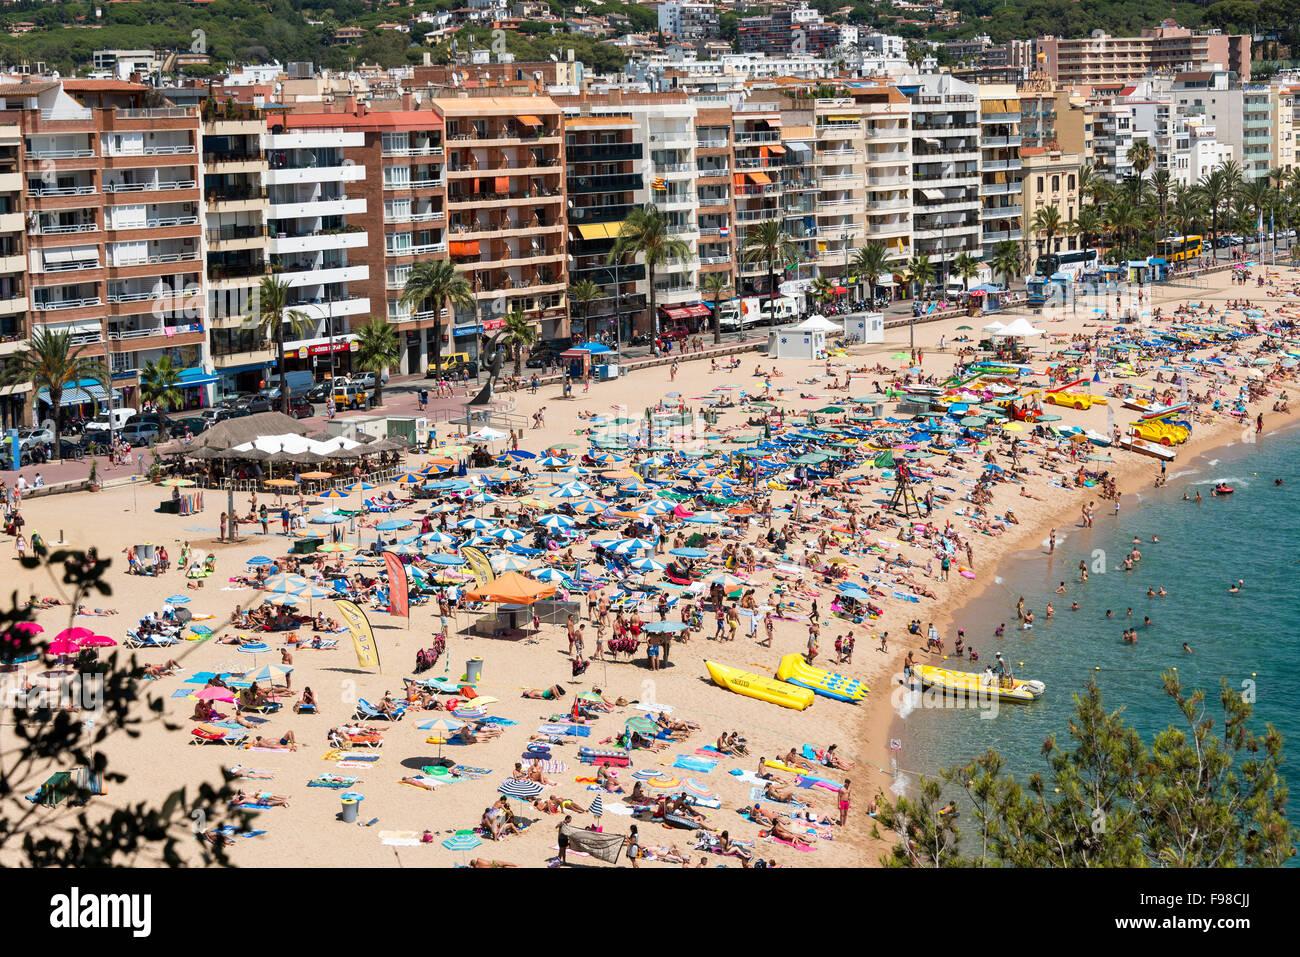 Lloret beach, Lloret de Mar, Costa Brava, Province of Girona, Catalonia, Spain - Stock Image